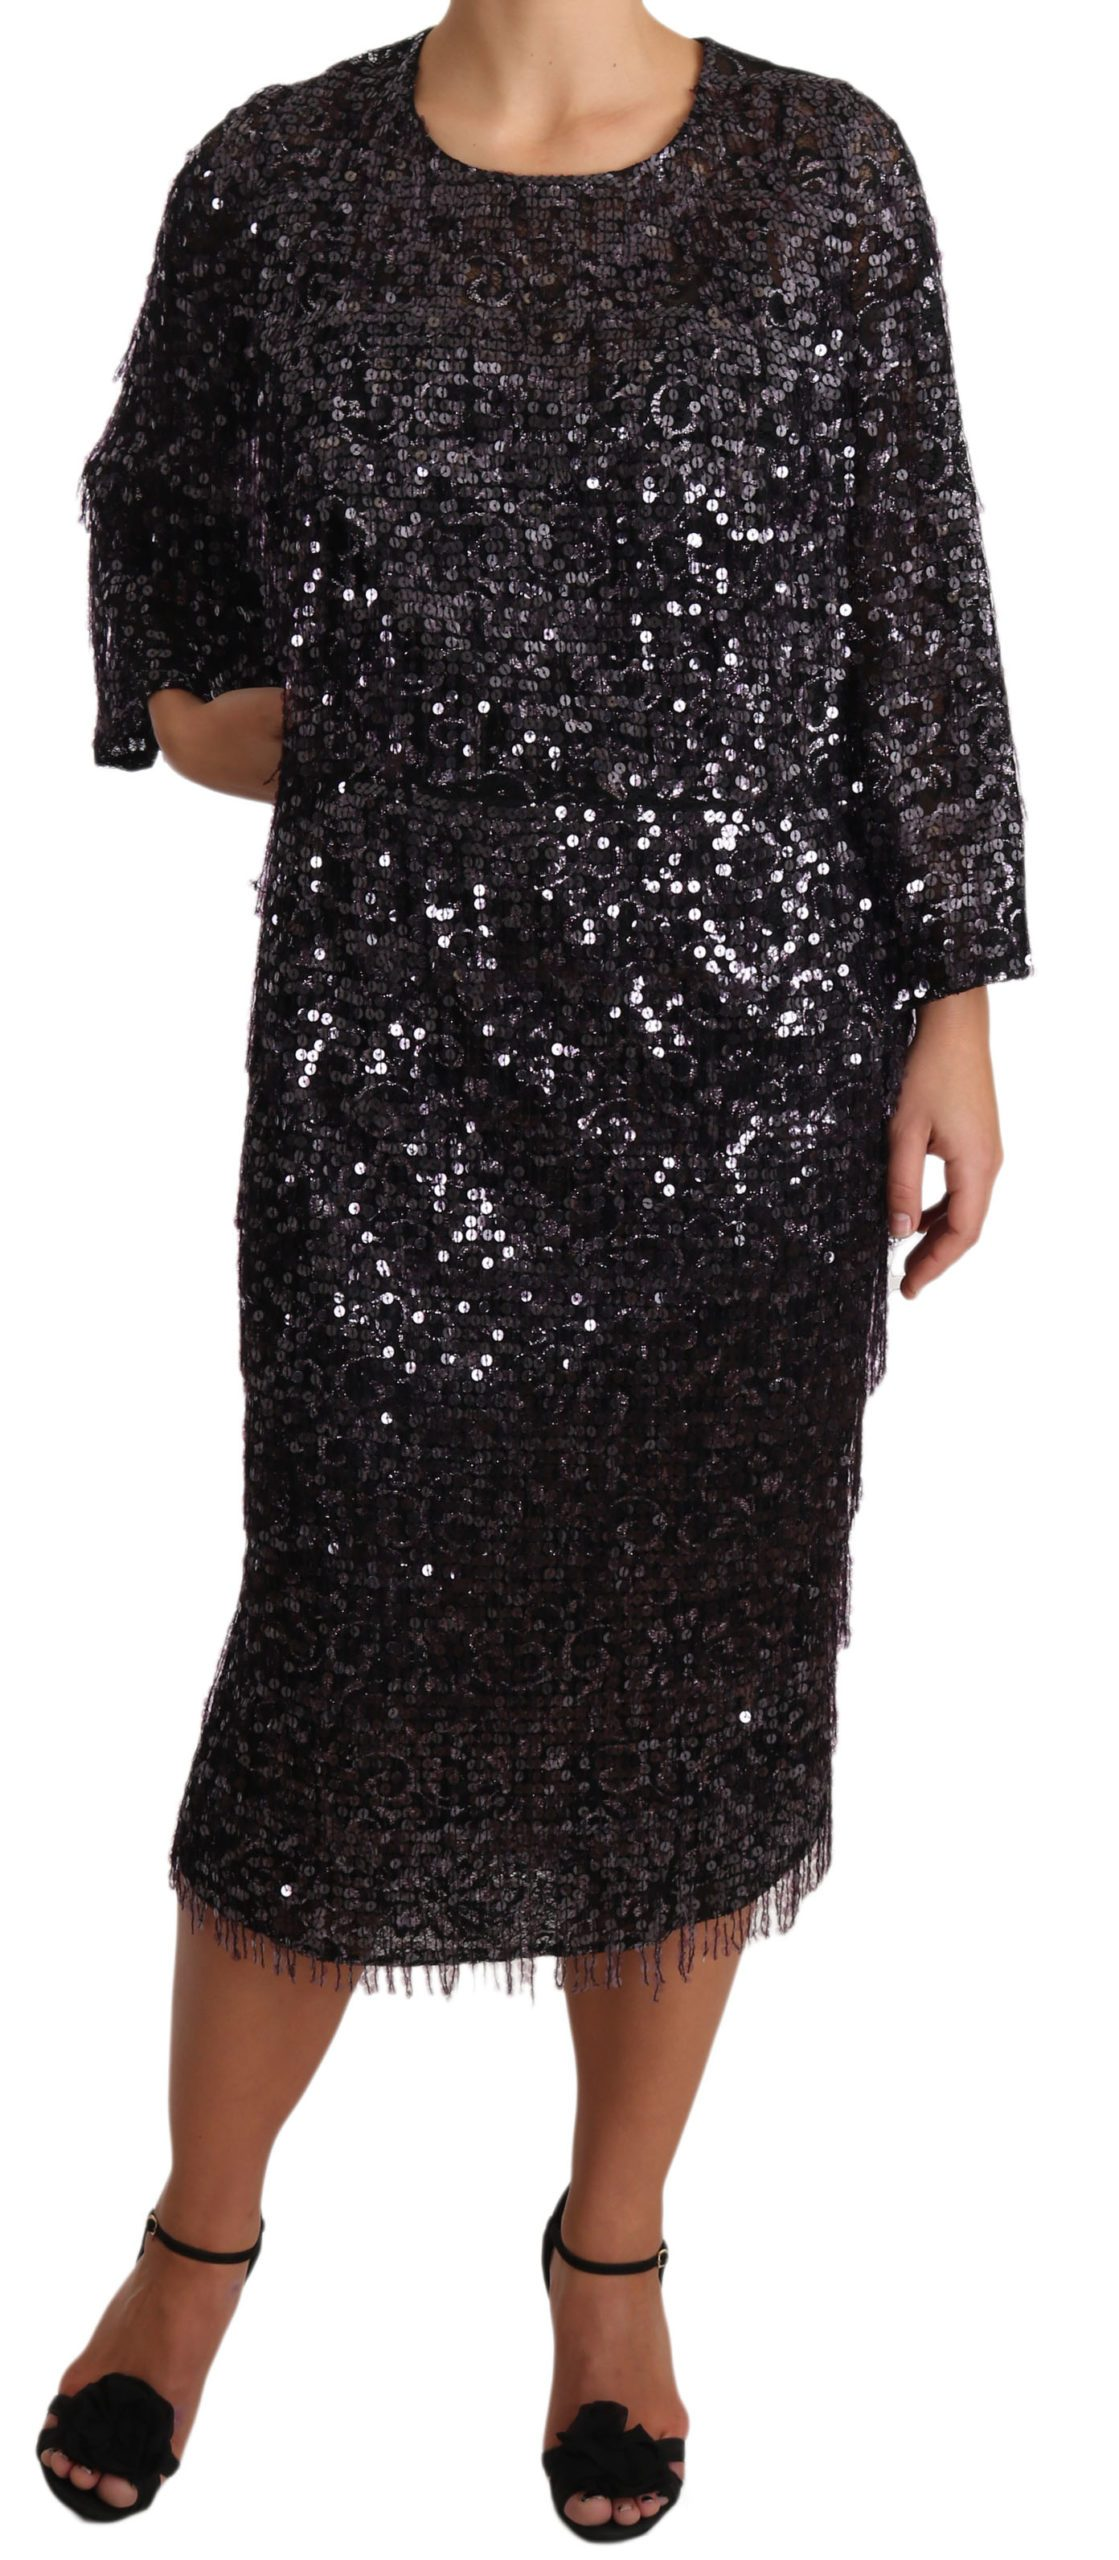 Dolce & Gabbana Women's Dress Black DR1929 - IT42|M